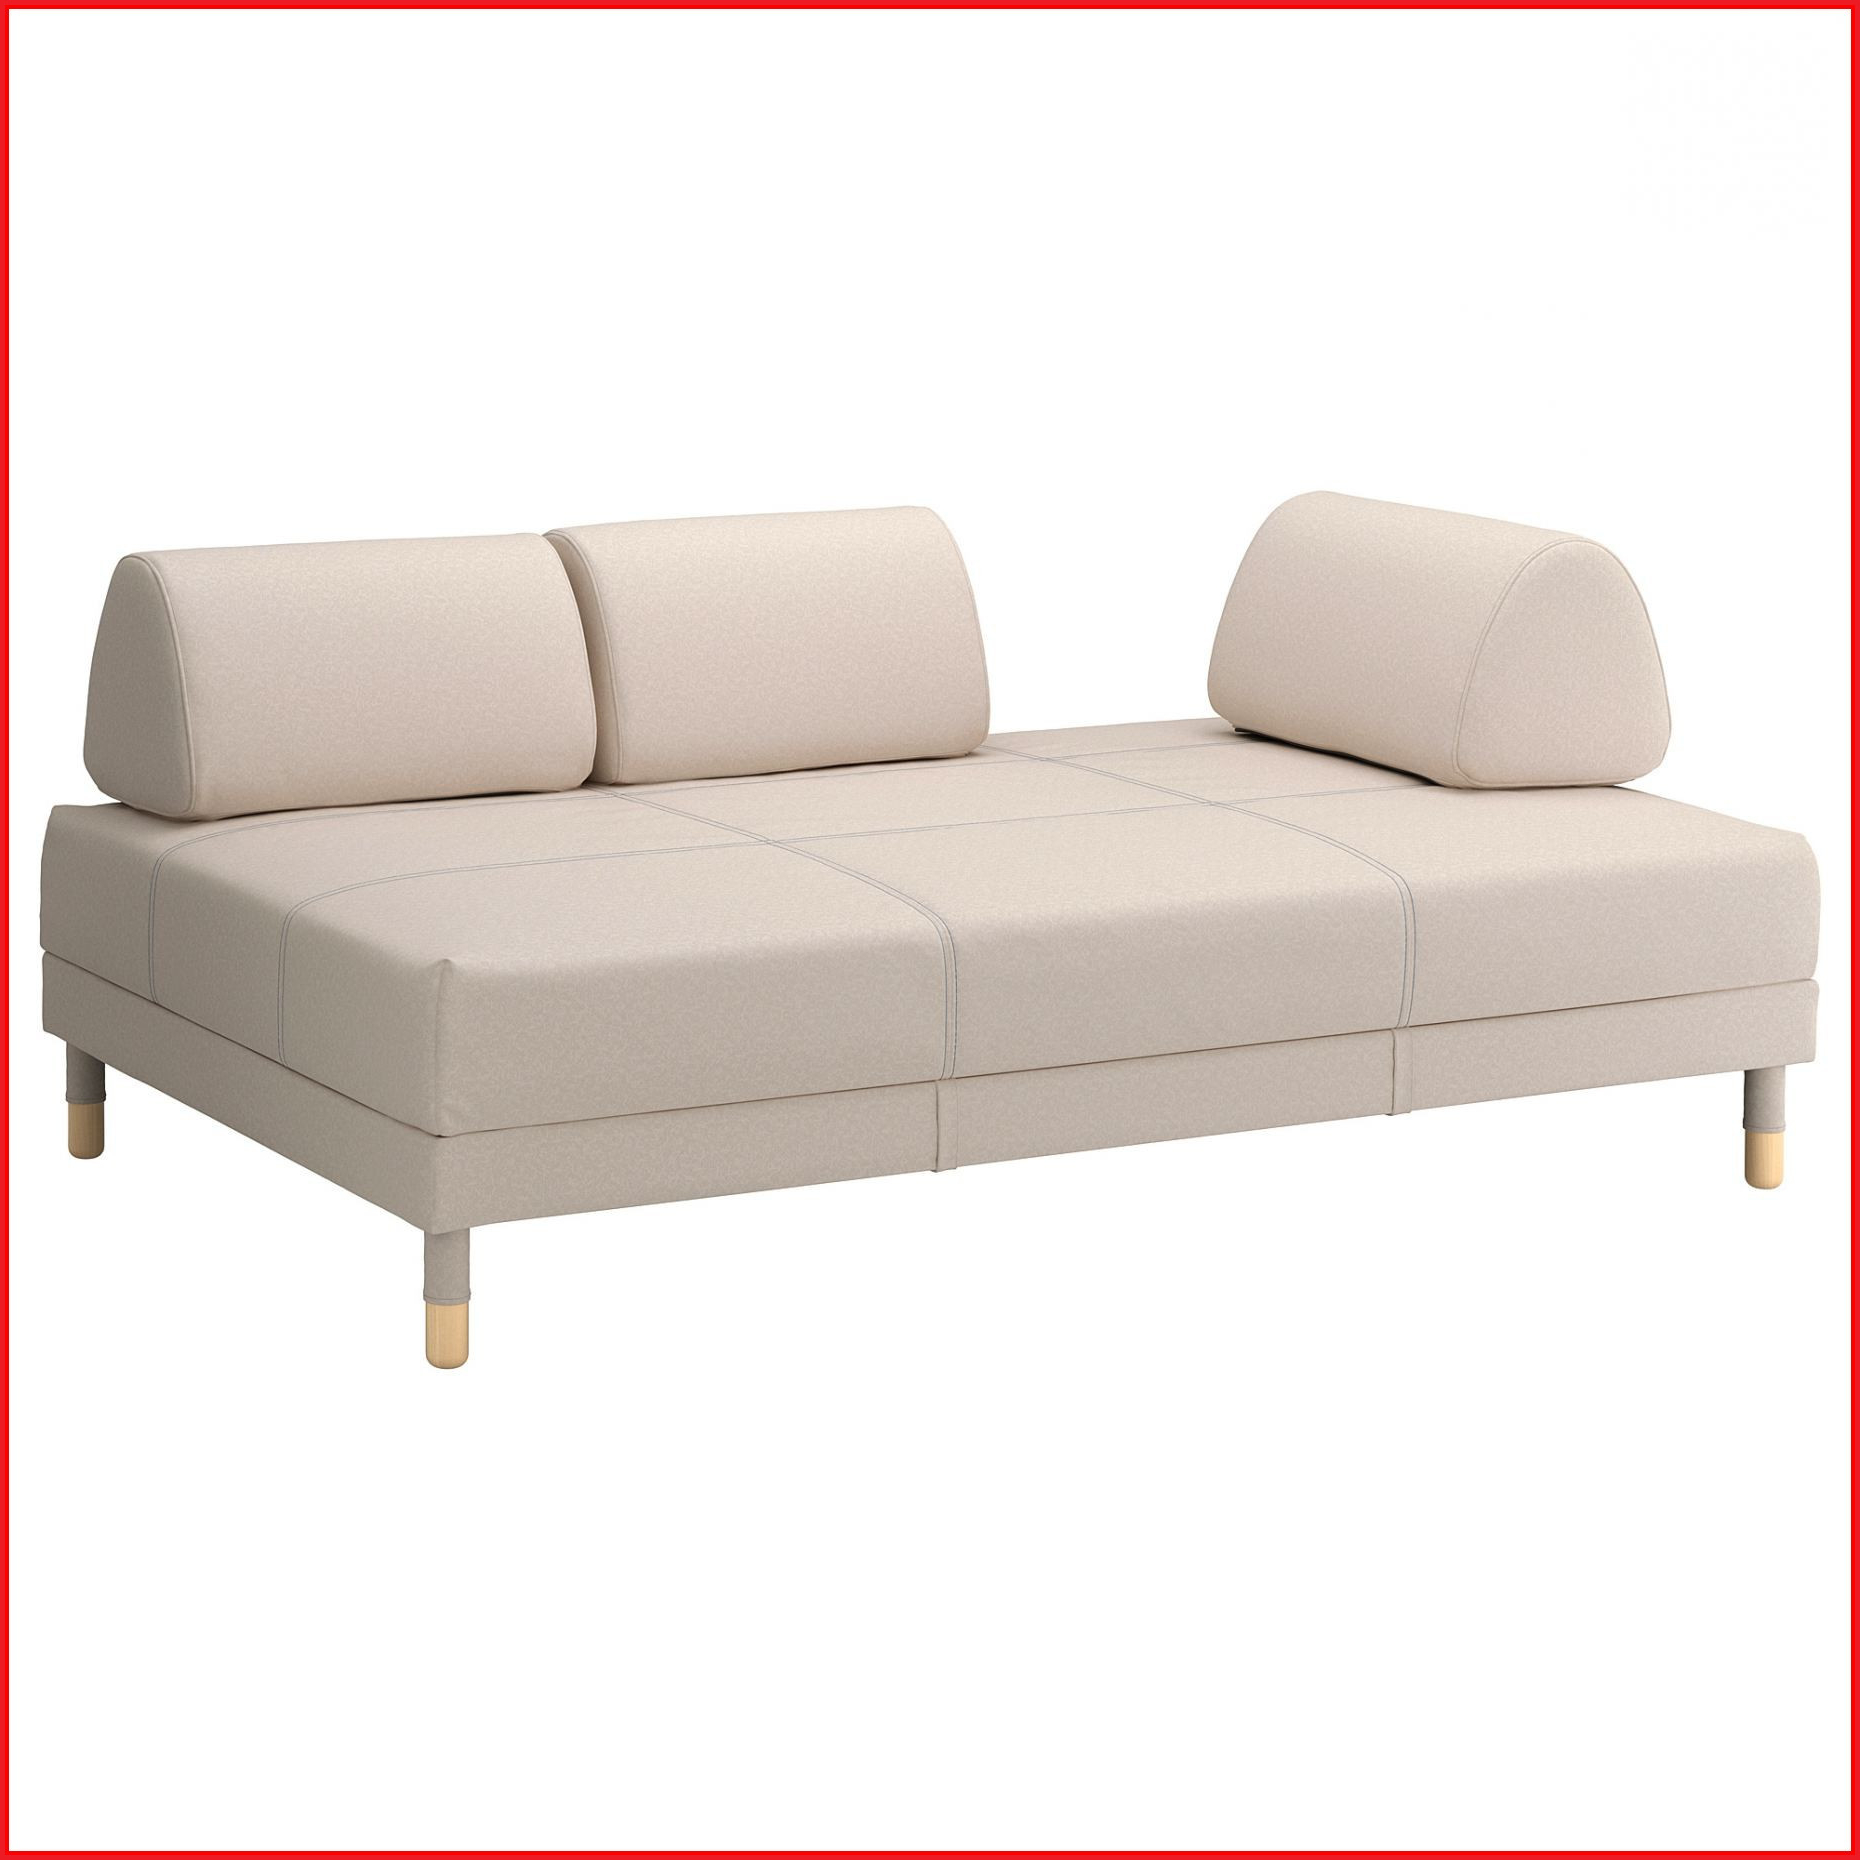 Sofa Cama De Diseño Ftd8 sofas Cama Diseà O Cama De NiO Charming Cama sofa Ikea Nice